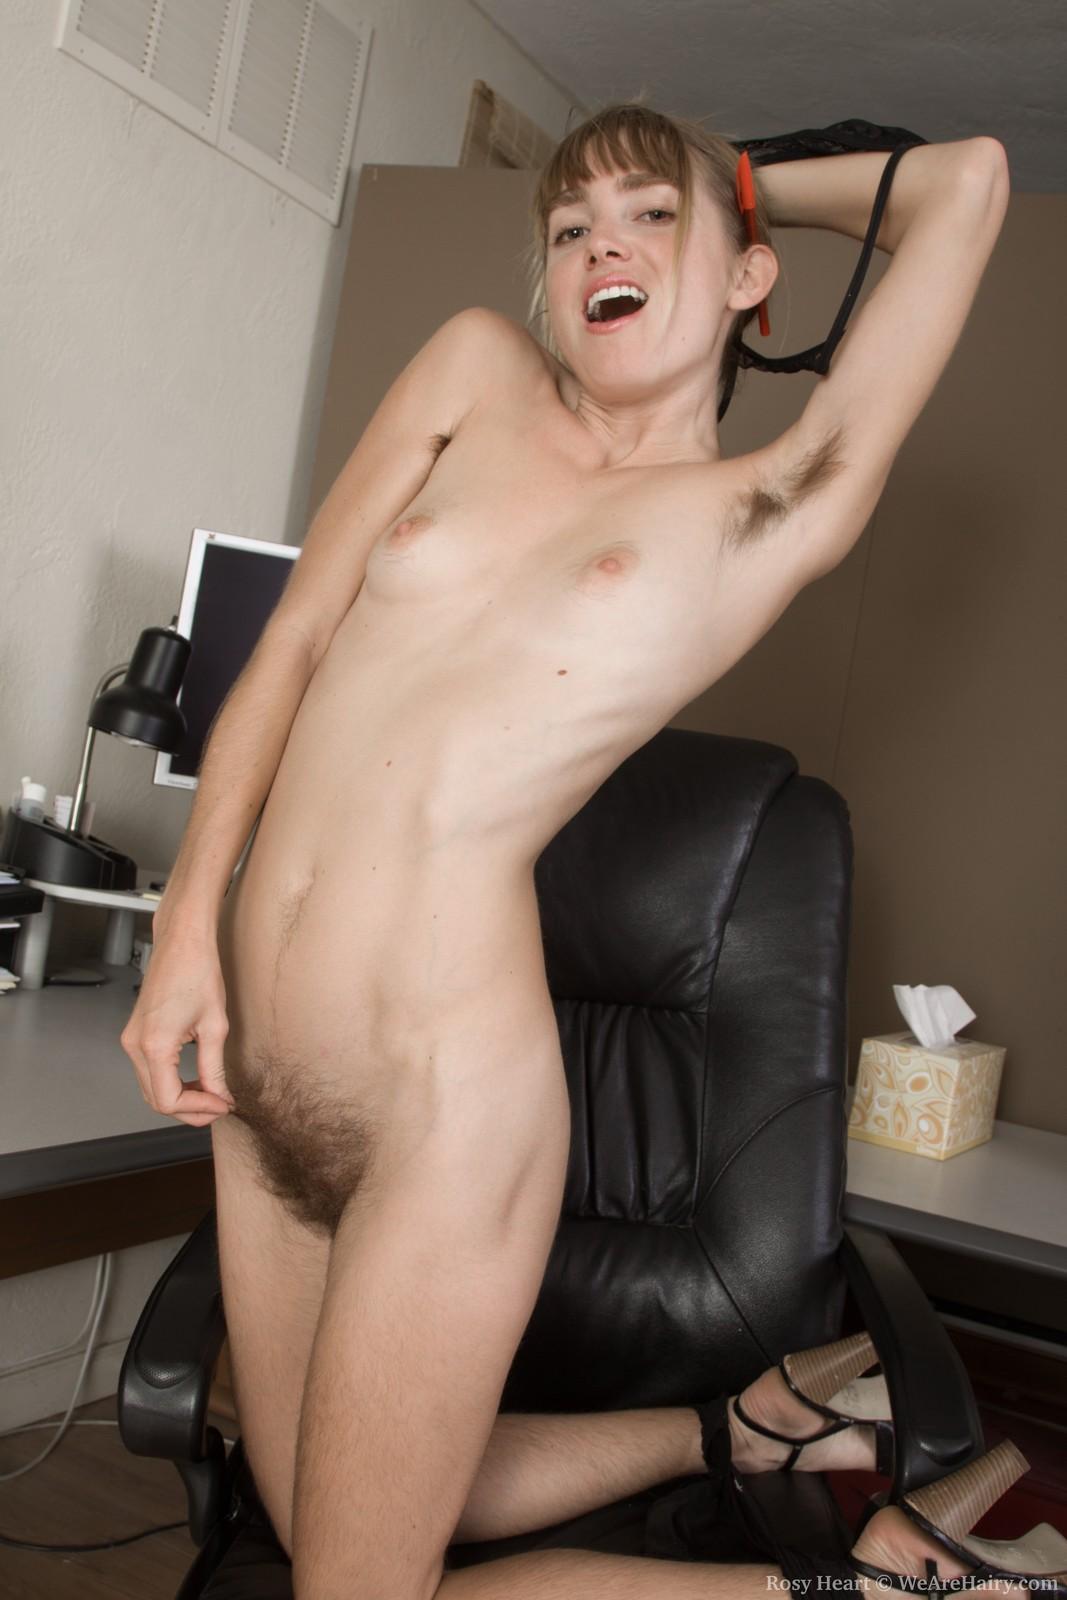 Very hairy nudist